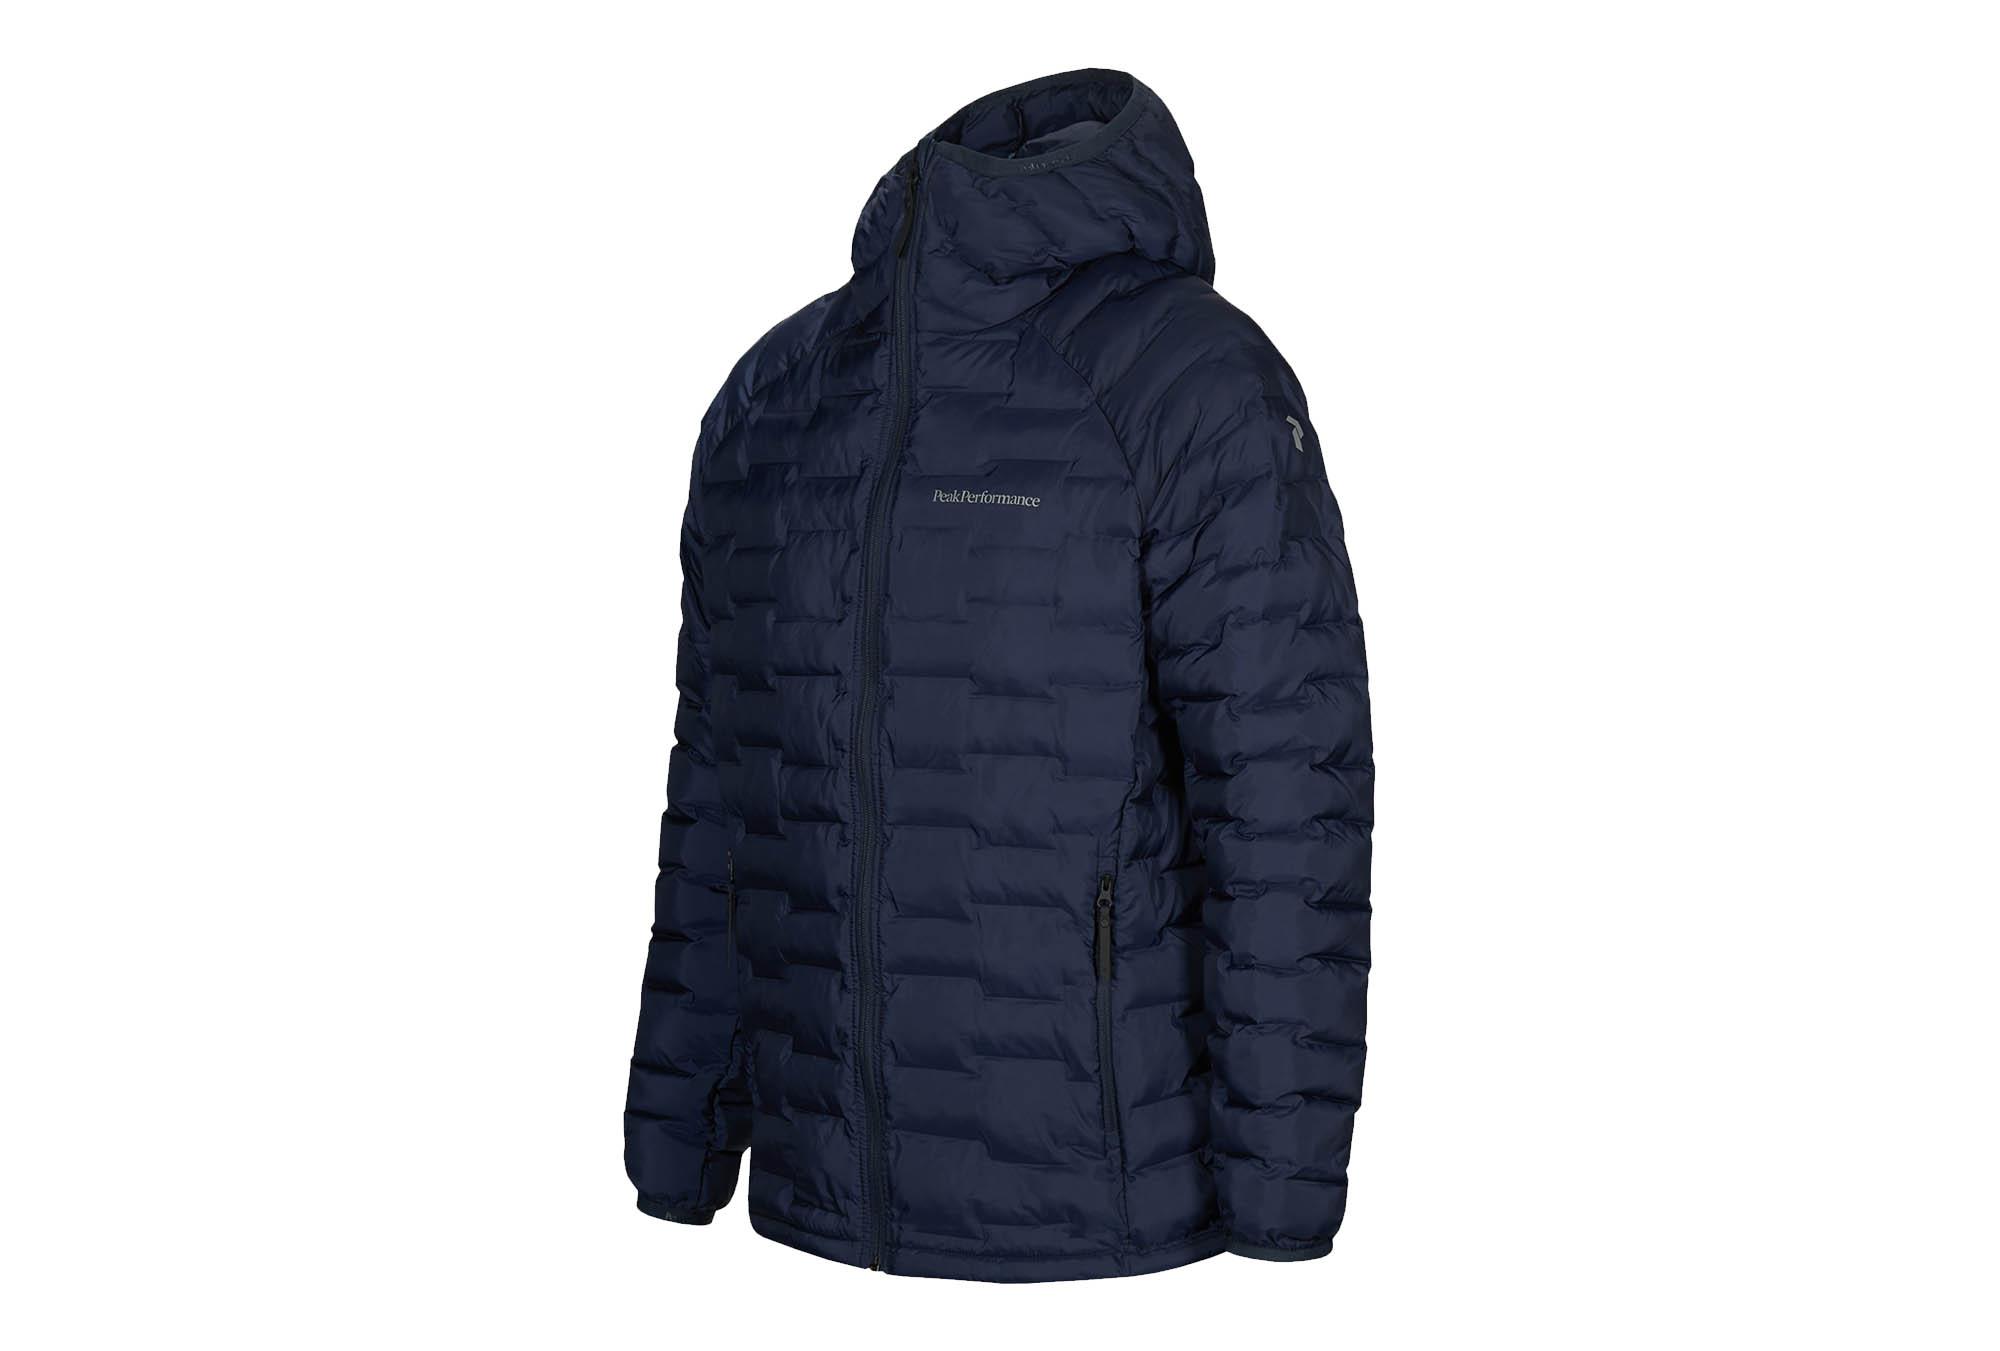 Winter 2020 Peak Performance World of Outdoor Sonthofen Allgäu Sportgeschäft Argon Light Hood Jacket n